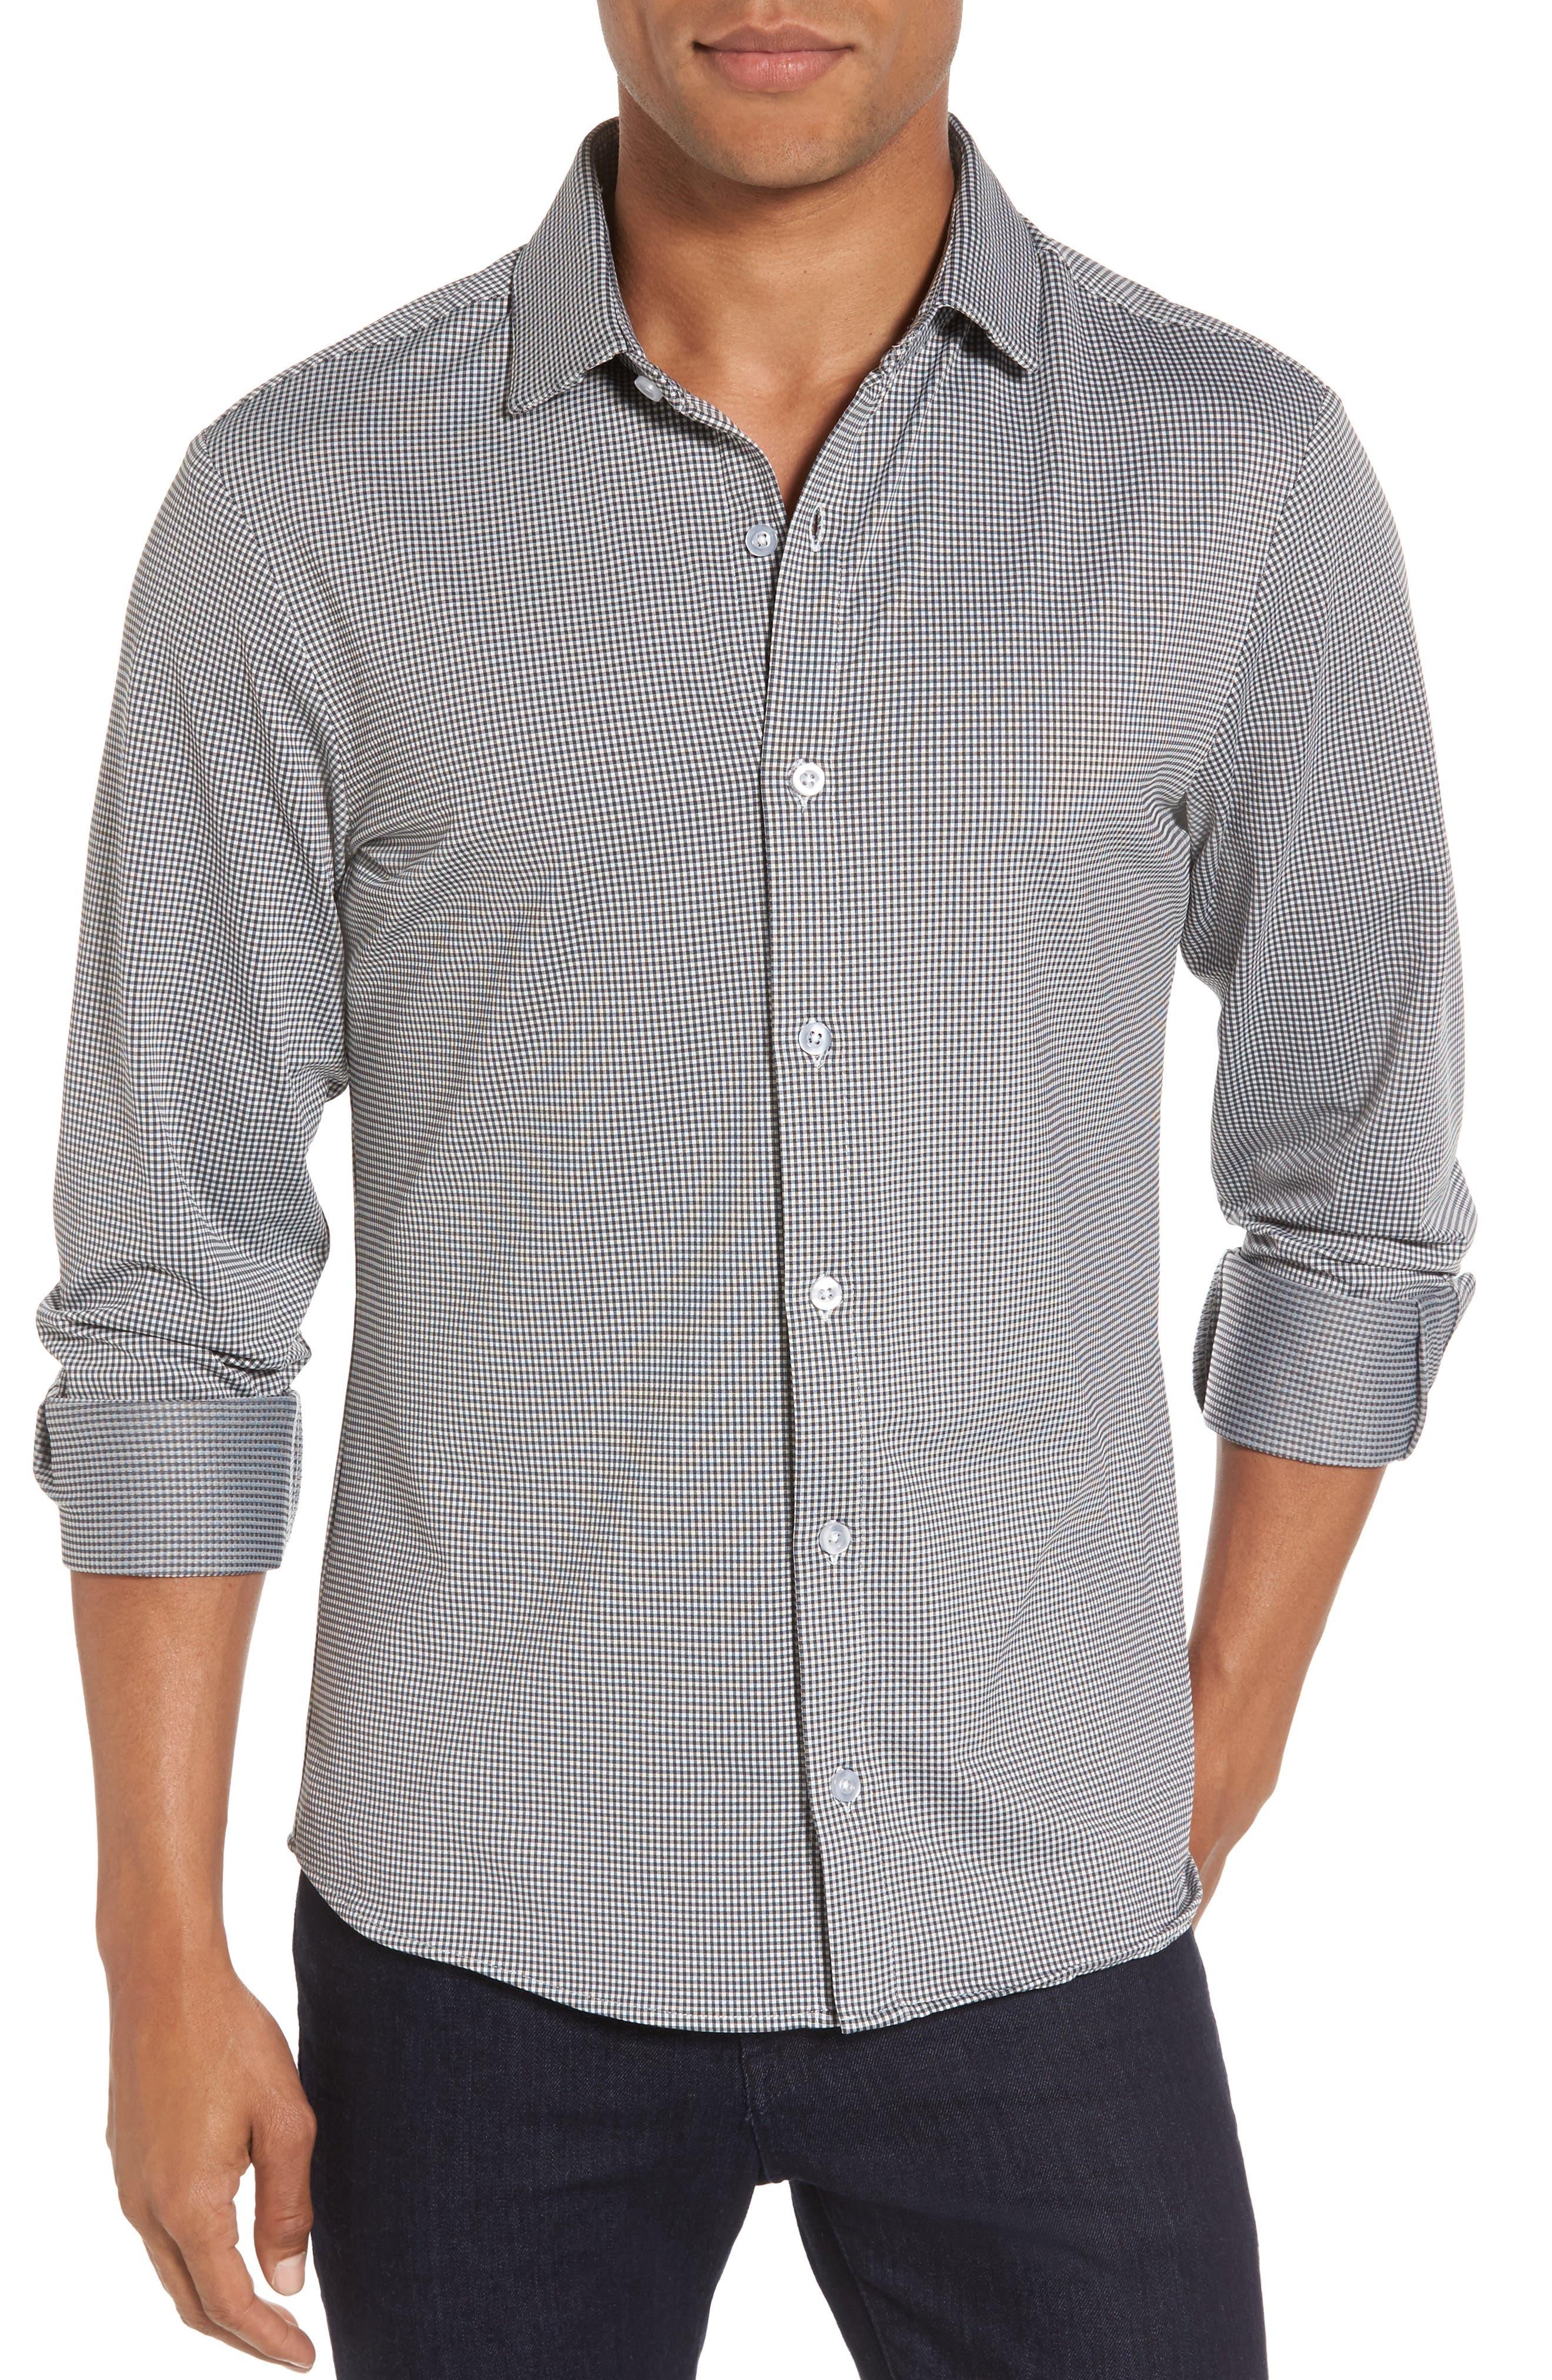 Davenport Gingham Sport Shirt,                         Main,                         color, Black Gingham